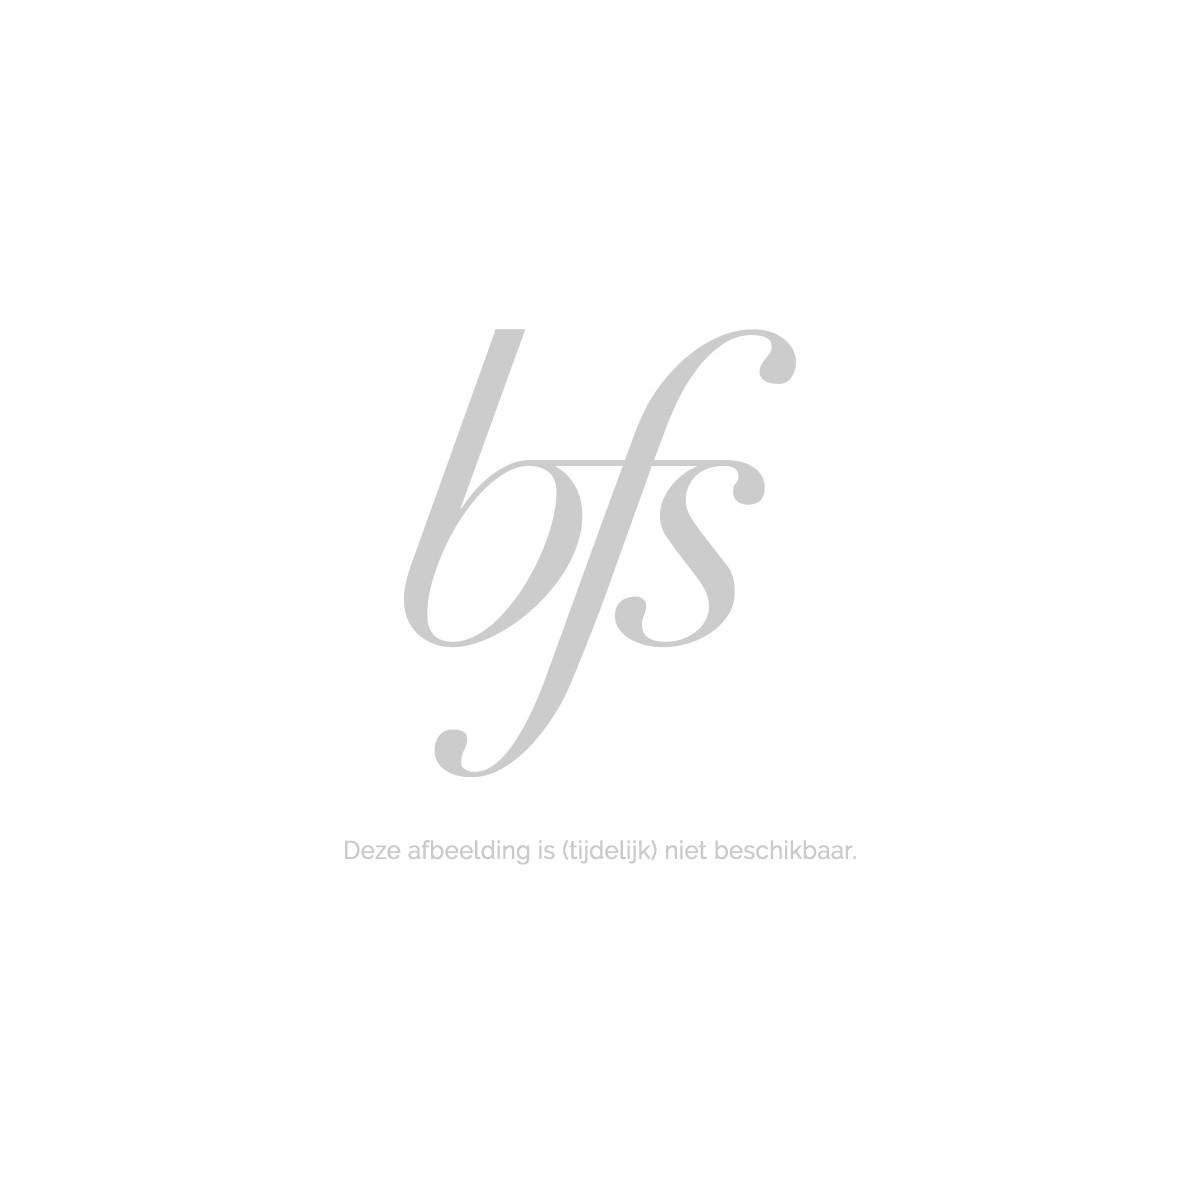 Ibp Soft Curing Led/Uv Light 48W